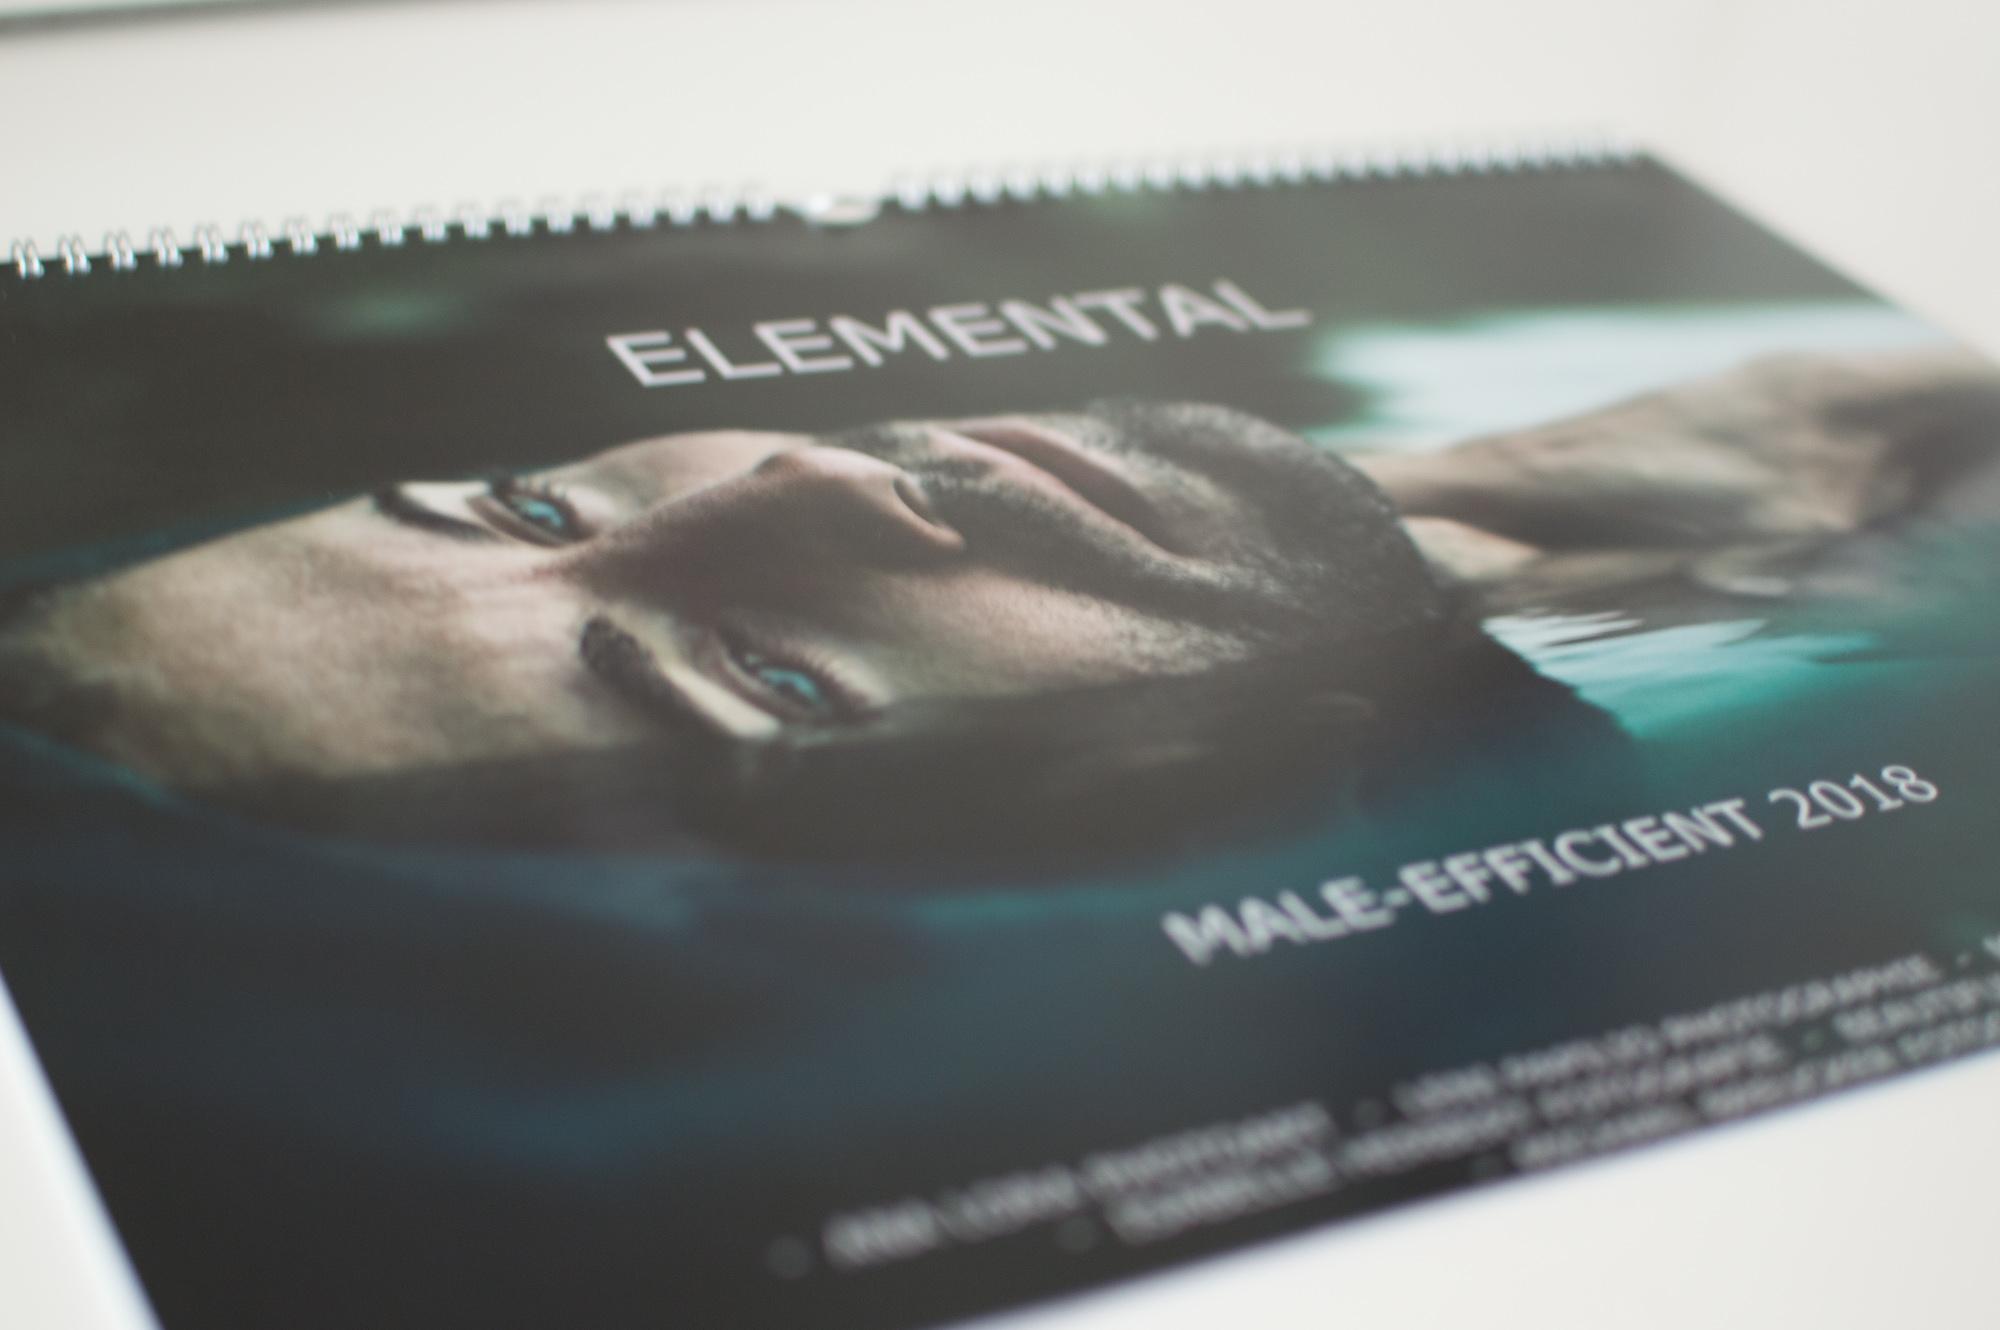 Kalender 2018, Kinderkrebsstiftung, Rames, Christine Raab, guter Zweck